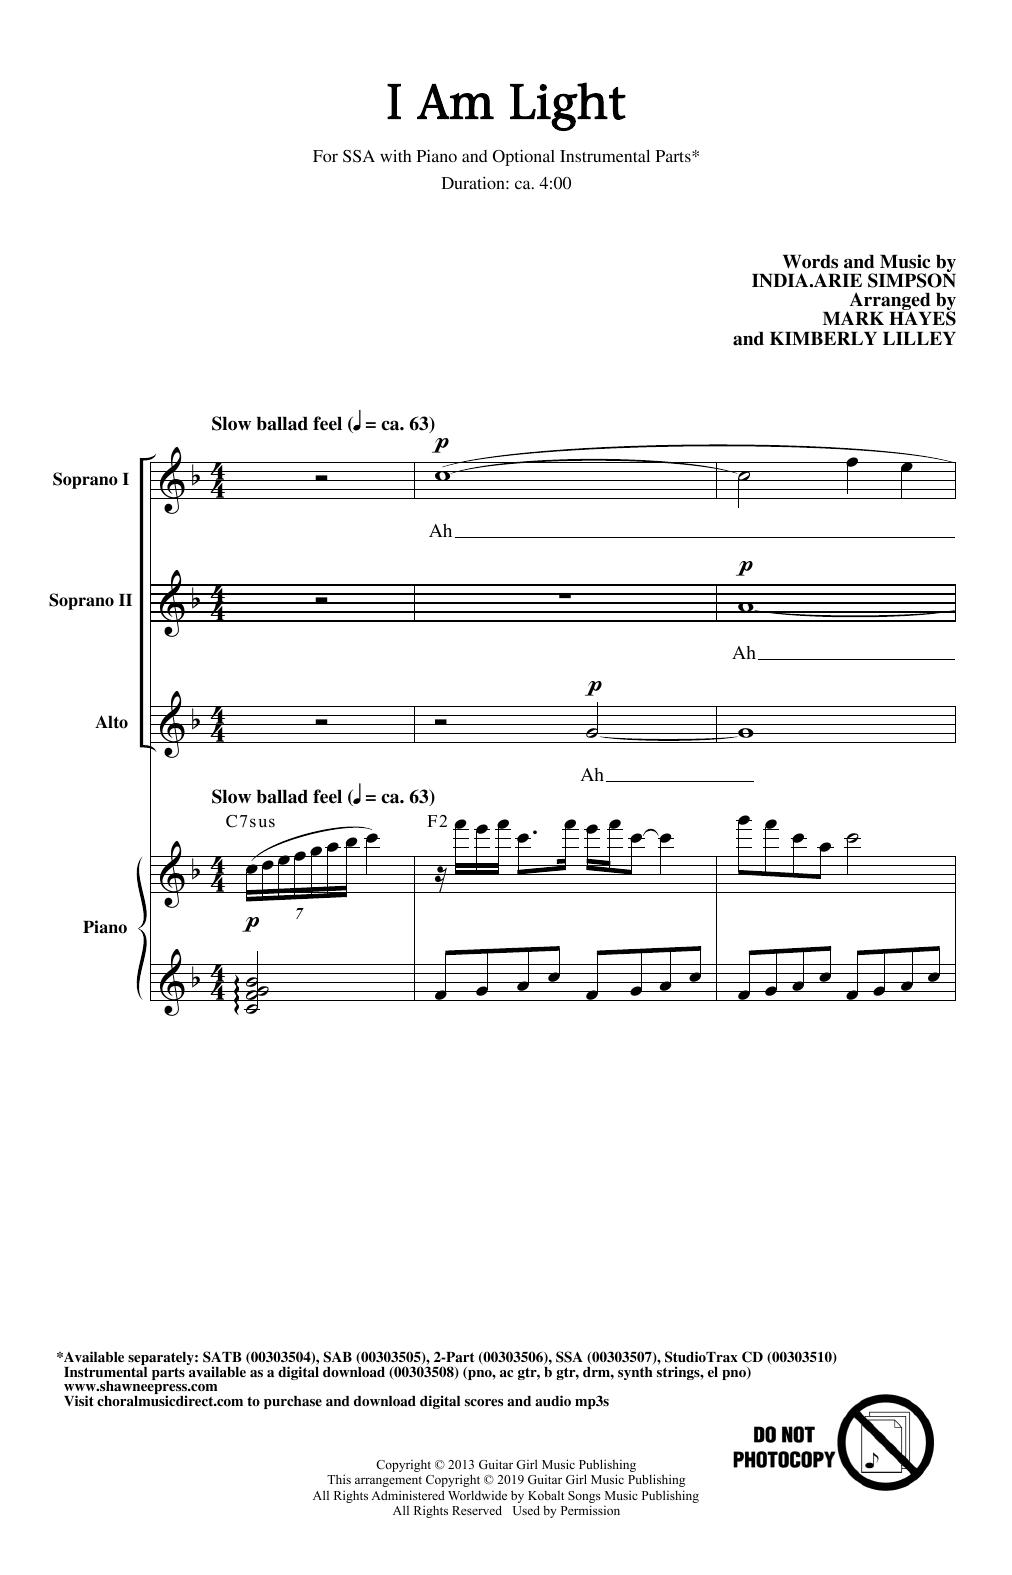 I Am Light (arr. Mark Hayes and Kimberly Lilley) (SSA Choir)